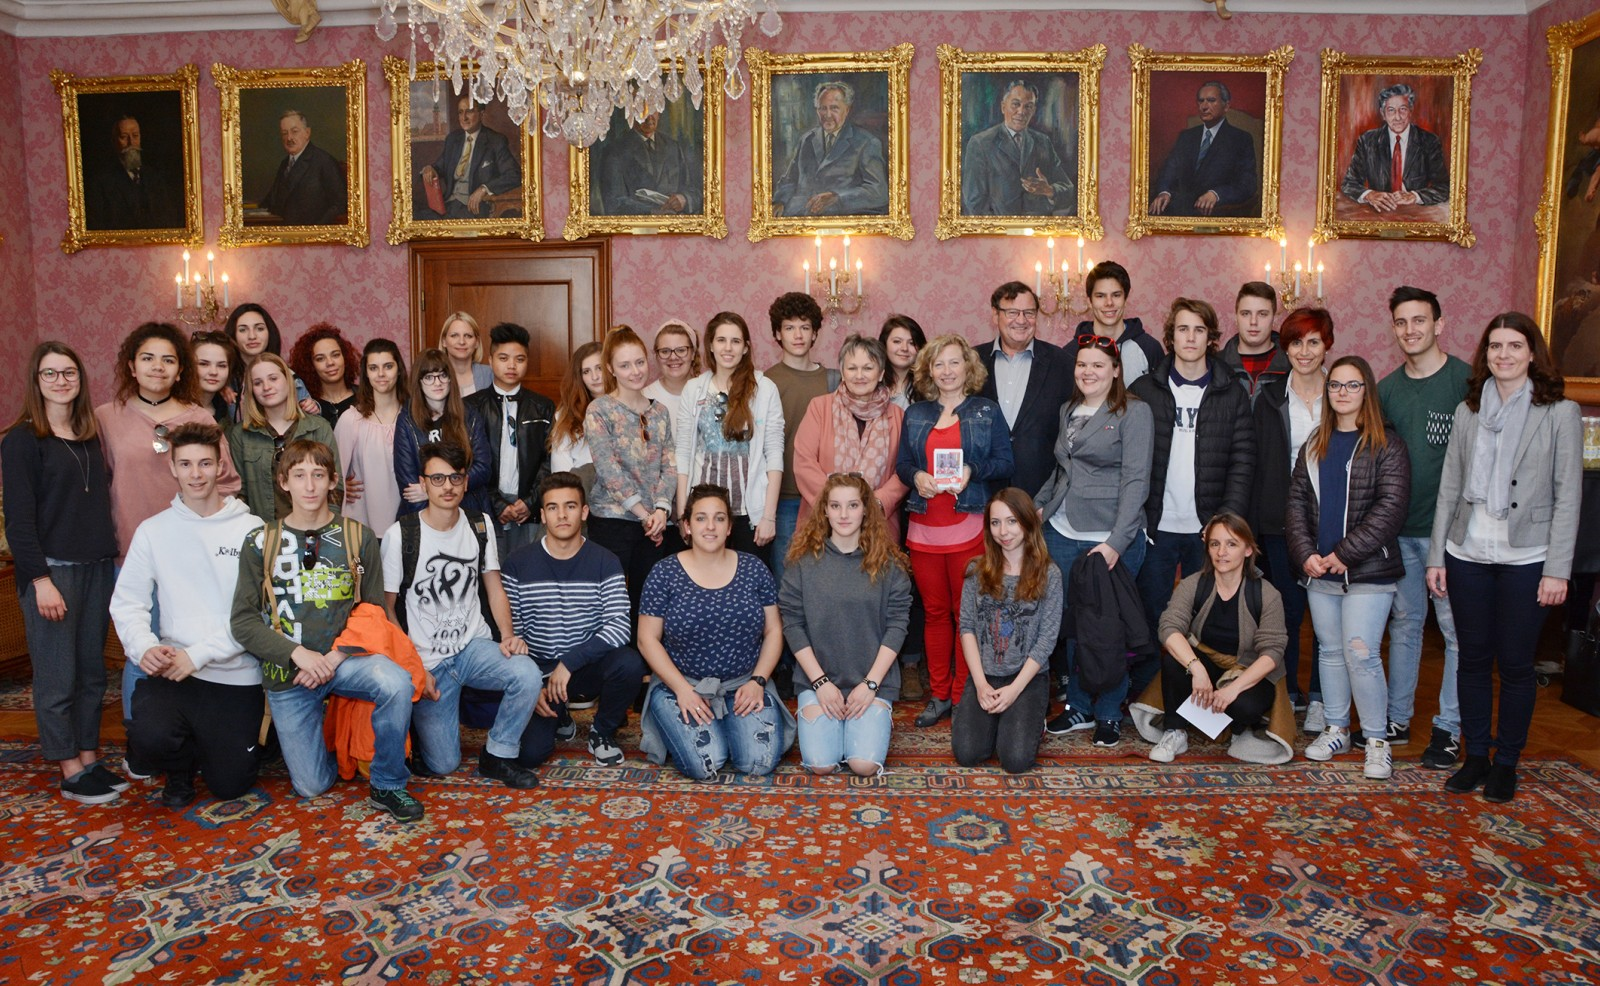 Schüler aus Verona besuchten St. Pölten